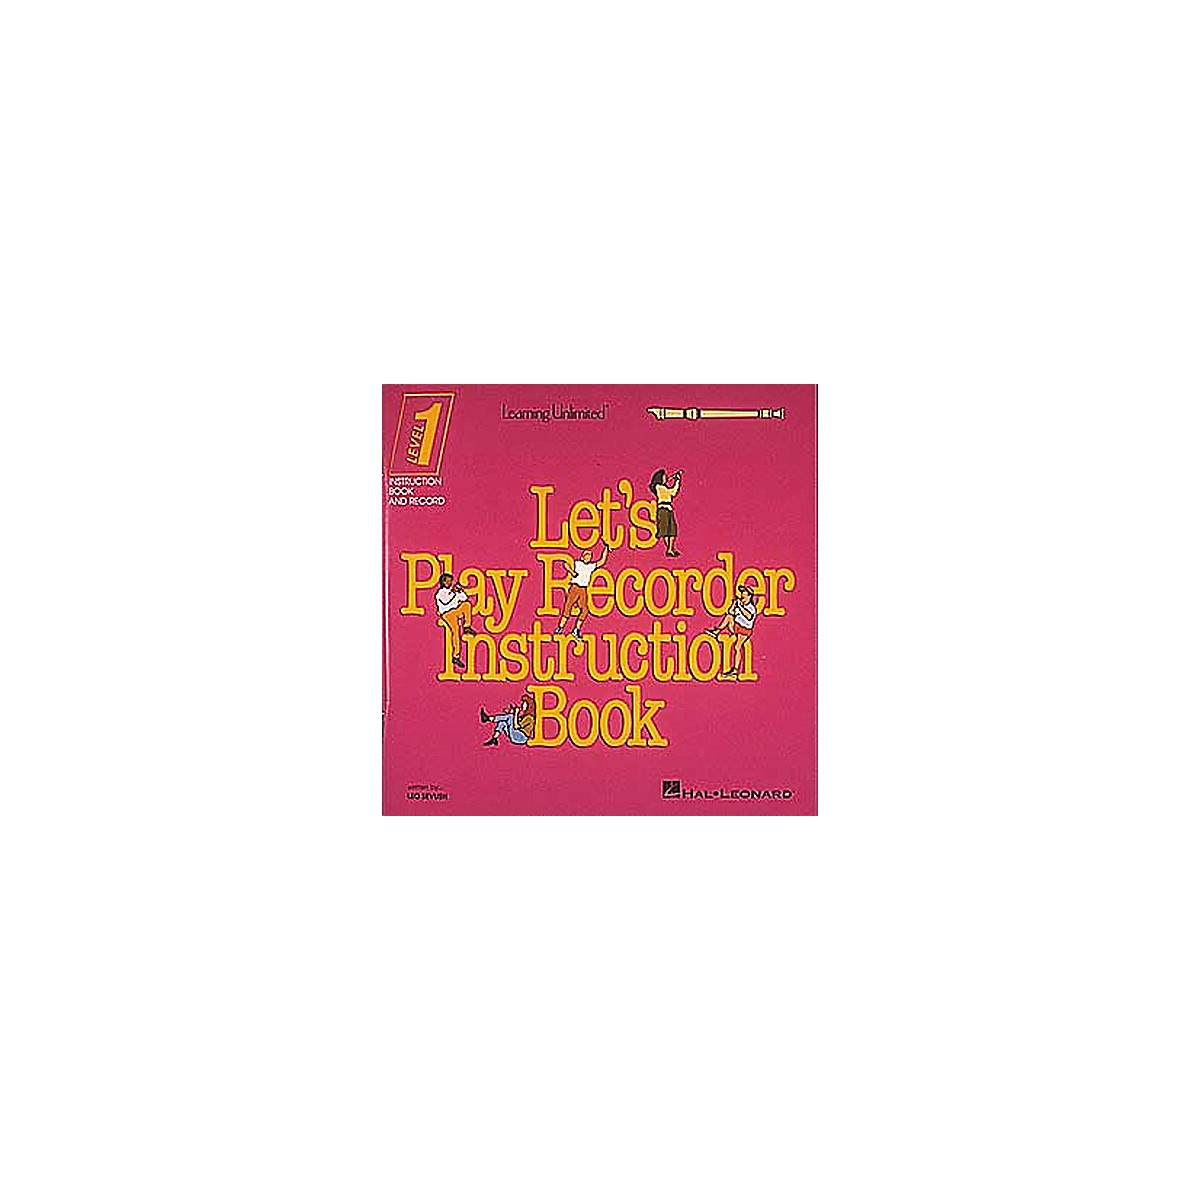 Hal Leonard Let's Play Recorder Instruction Book - Level 1